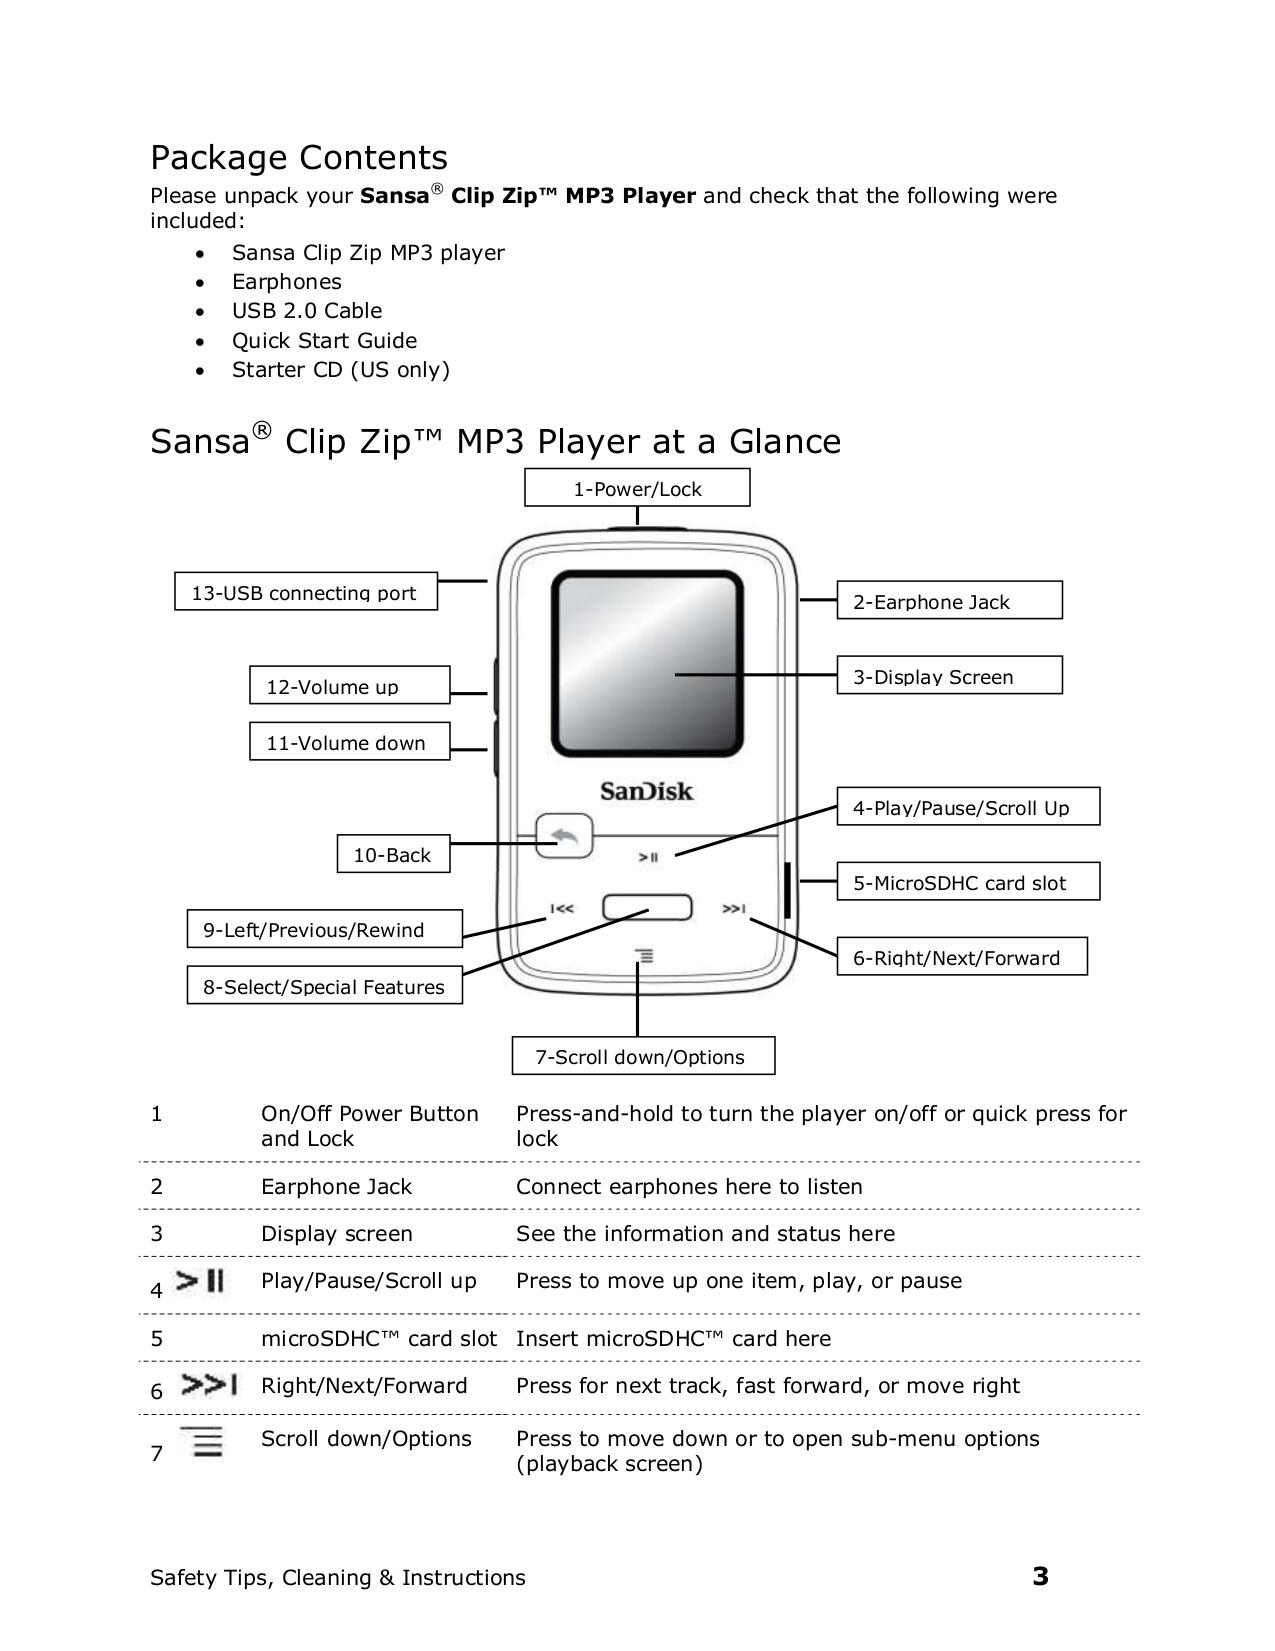 pdf manual for sandisk mp3 player sansa sansa clip zip 8gb rh umlib com SanDisk Sansa Clip Zip Problems SanDisk Clip Zip Screen